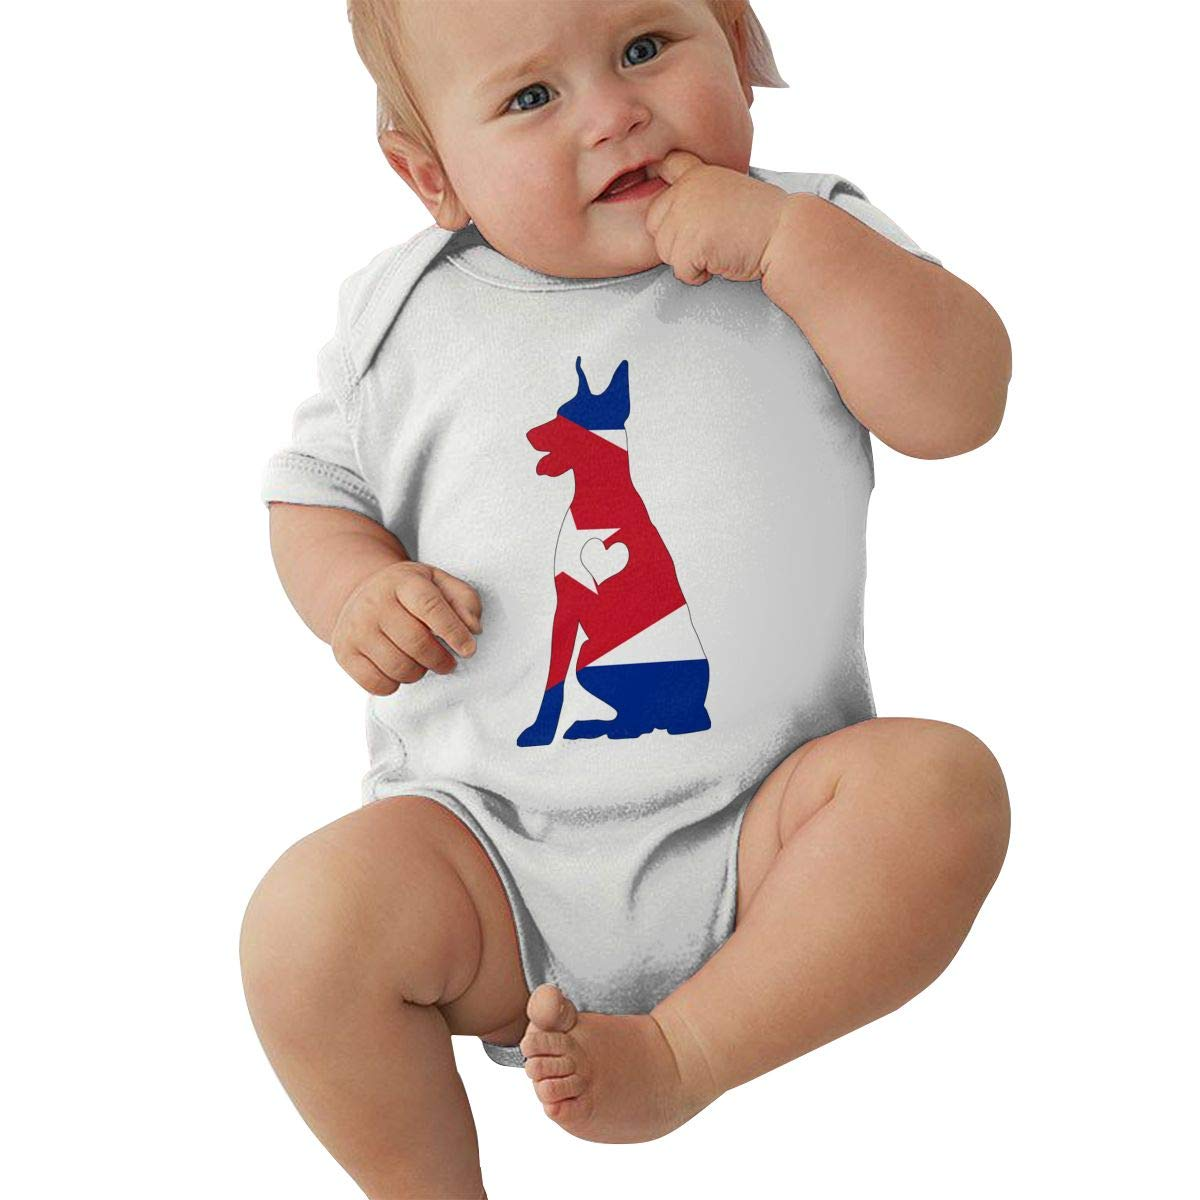 Mri-le2 Newborn Baby Short Sleeve Jumpsuit Cuba Flag Adore Dobermans Dog Toddler Clothes